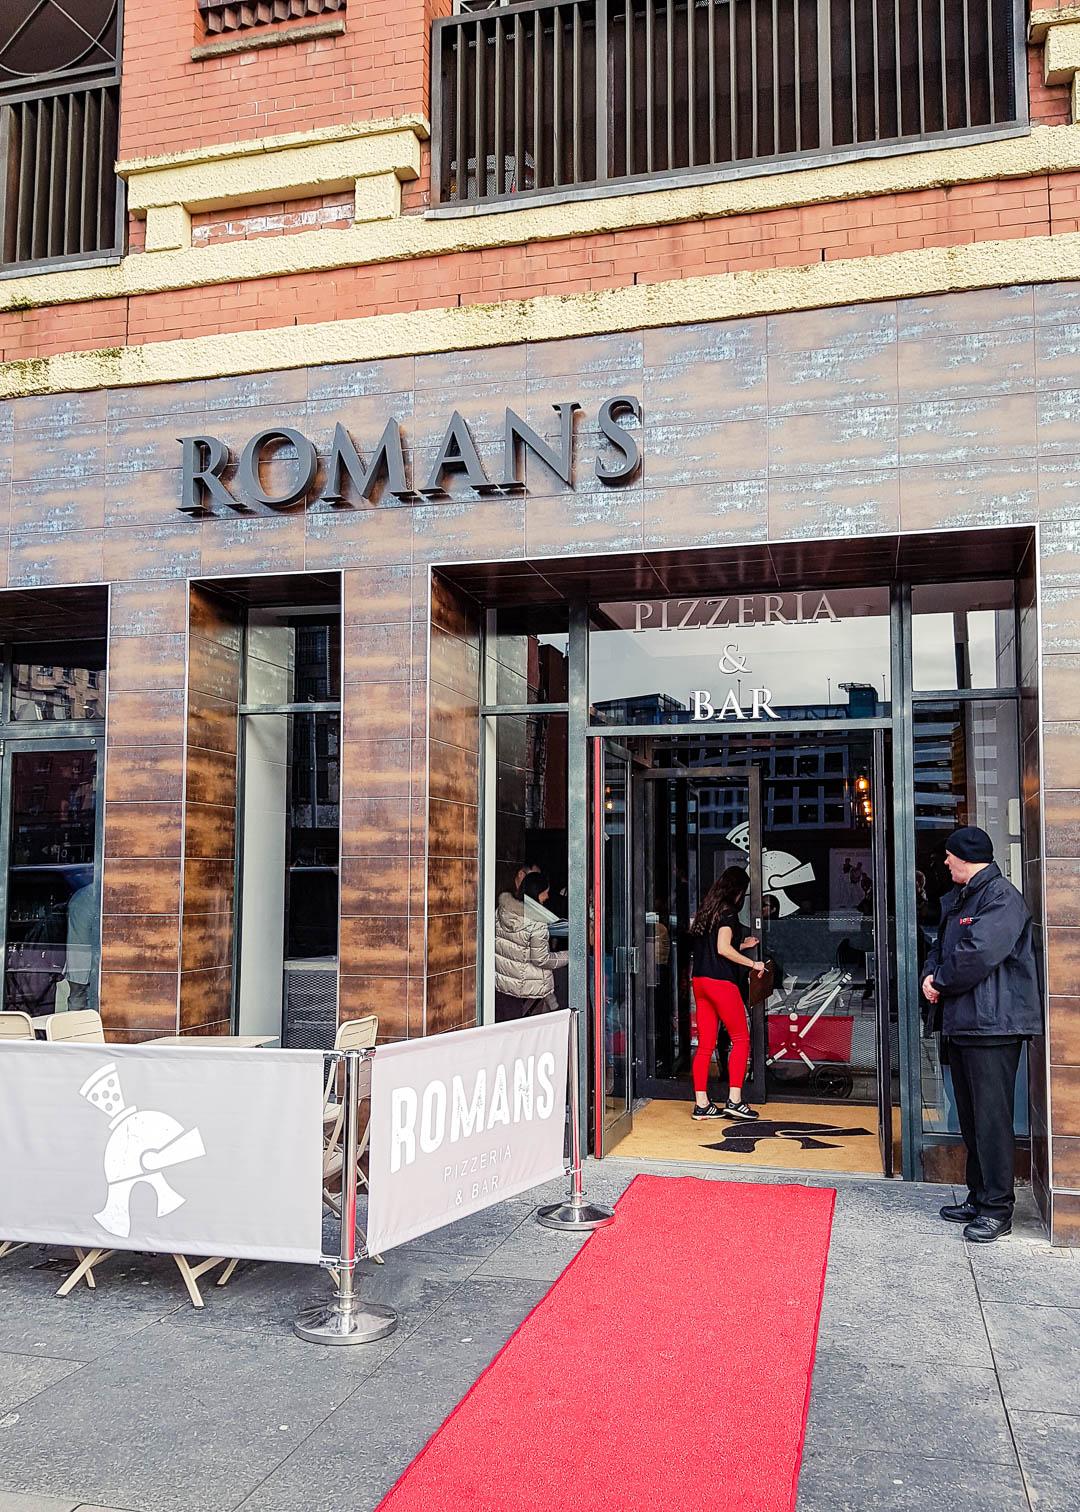 The entrance to the new vegan-friendly restaurant Romans Pizzeria Glasgow.